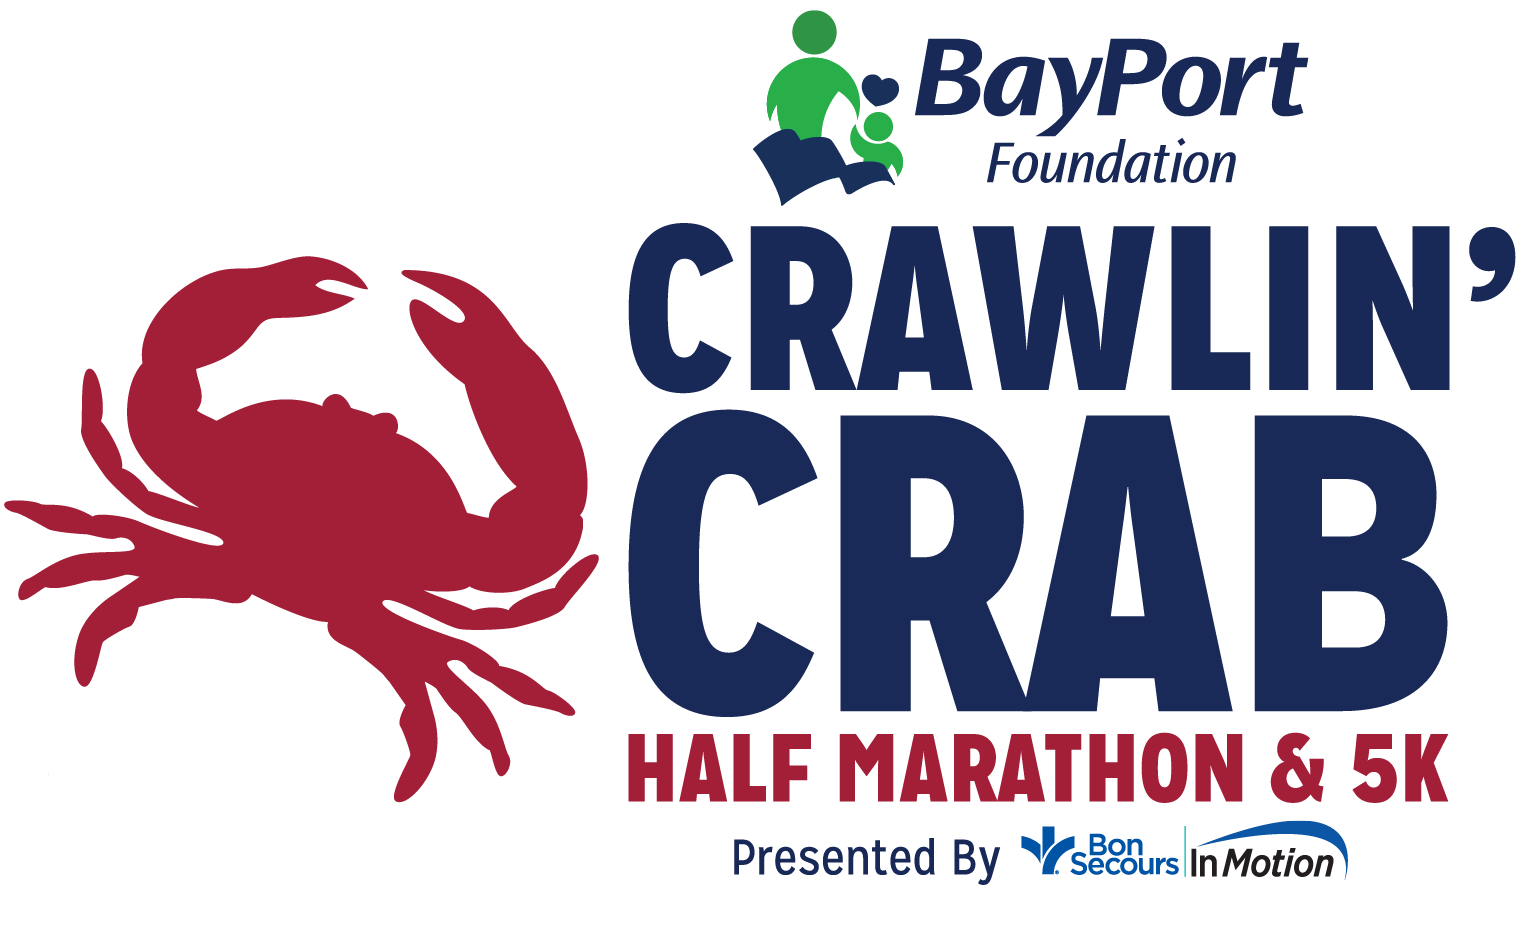 Run, Crawl, Shellebrate! Logo